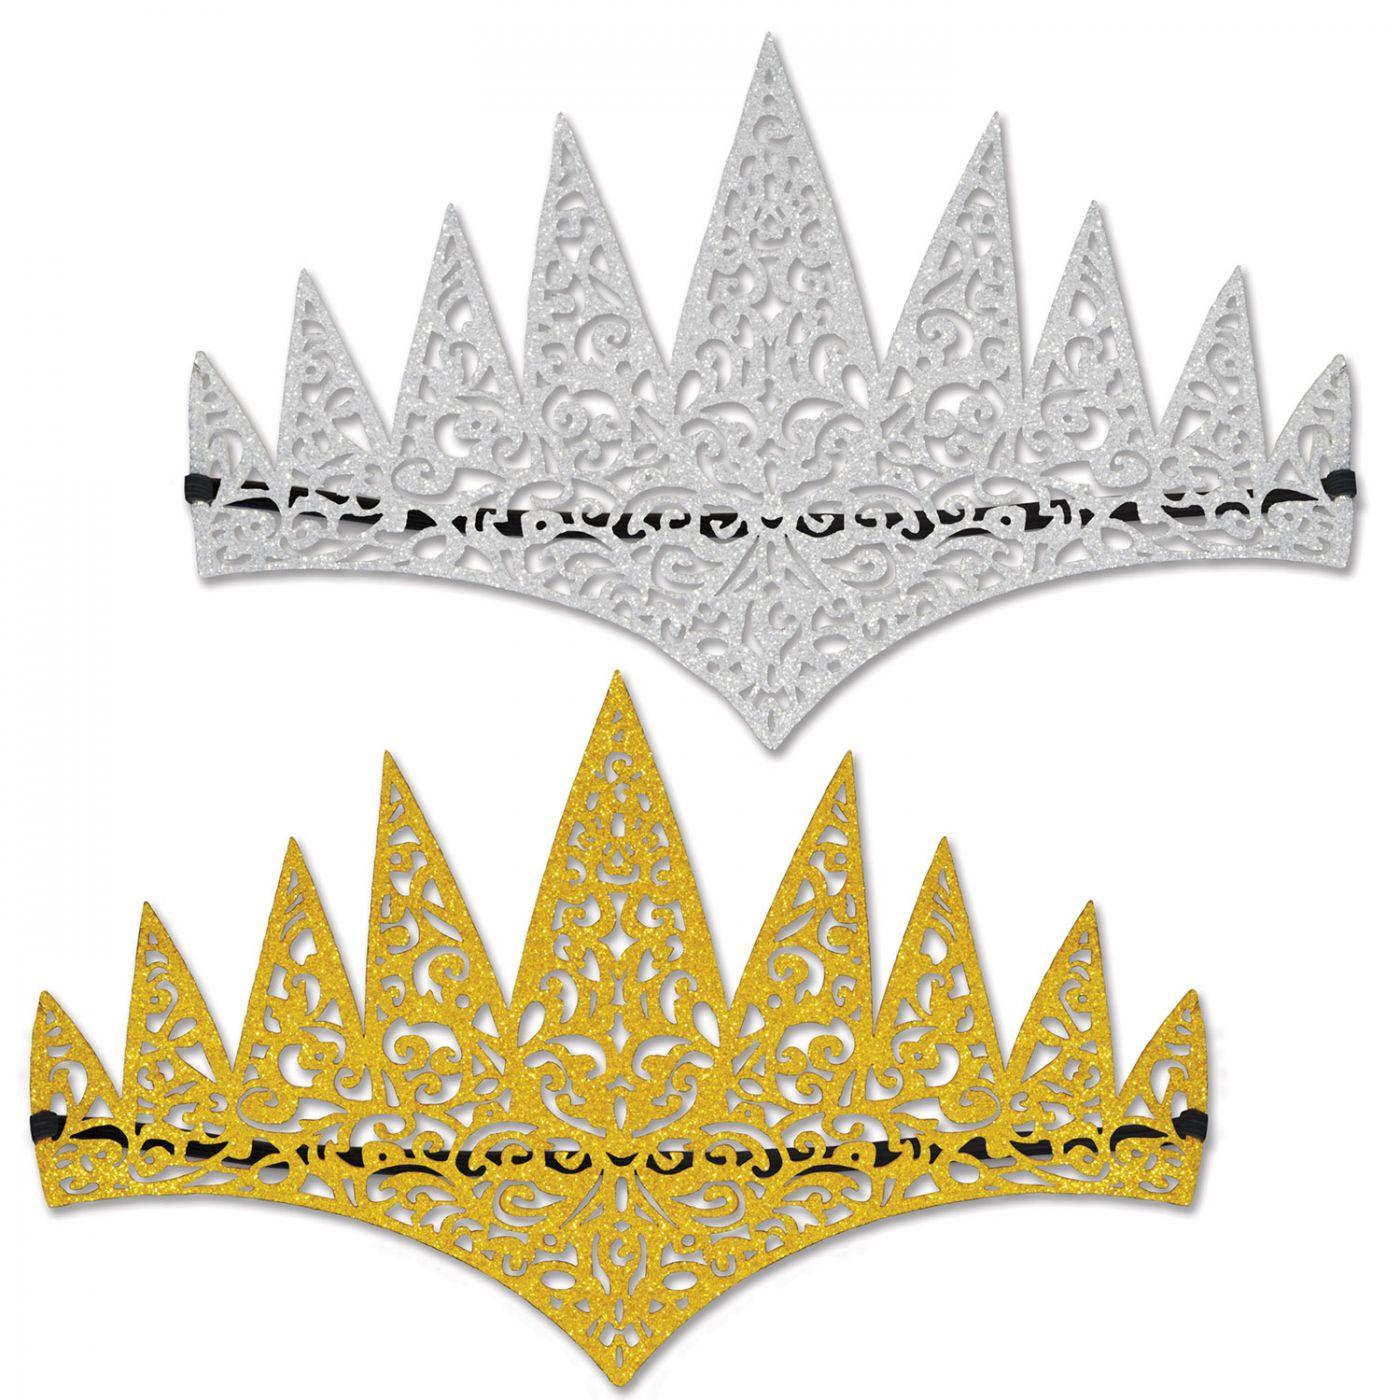 Glittered Laser Cut Tiaras image